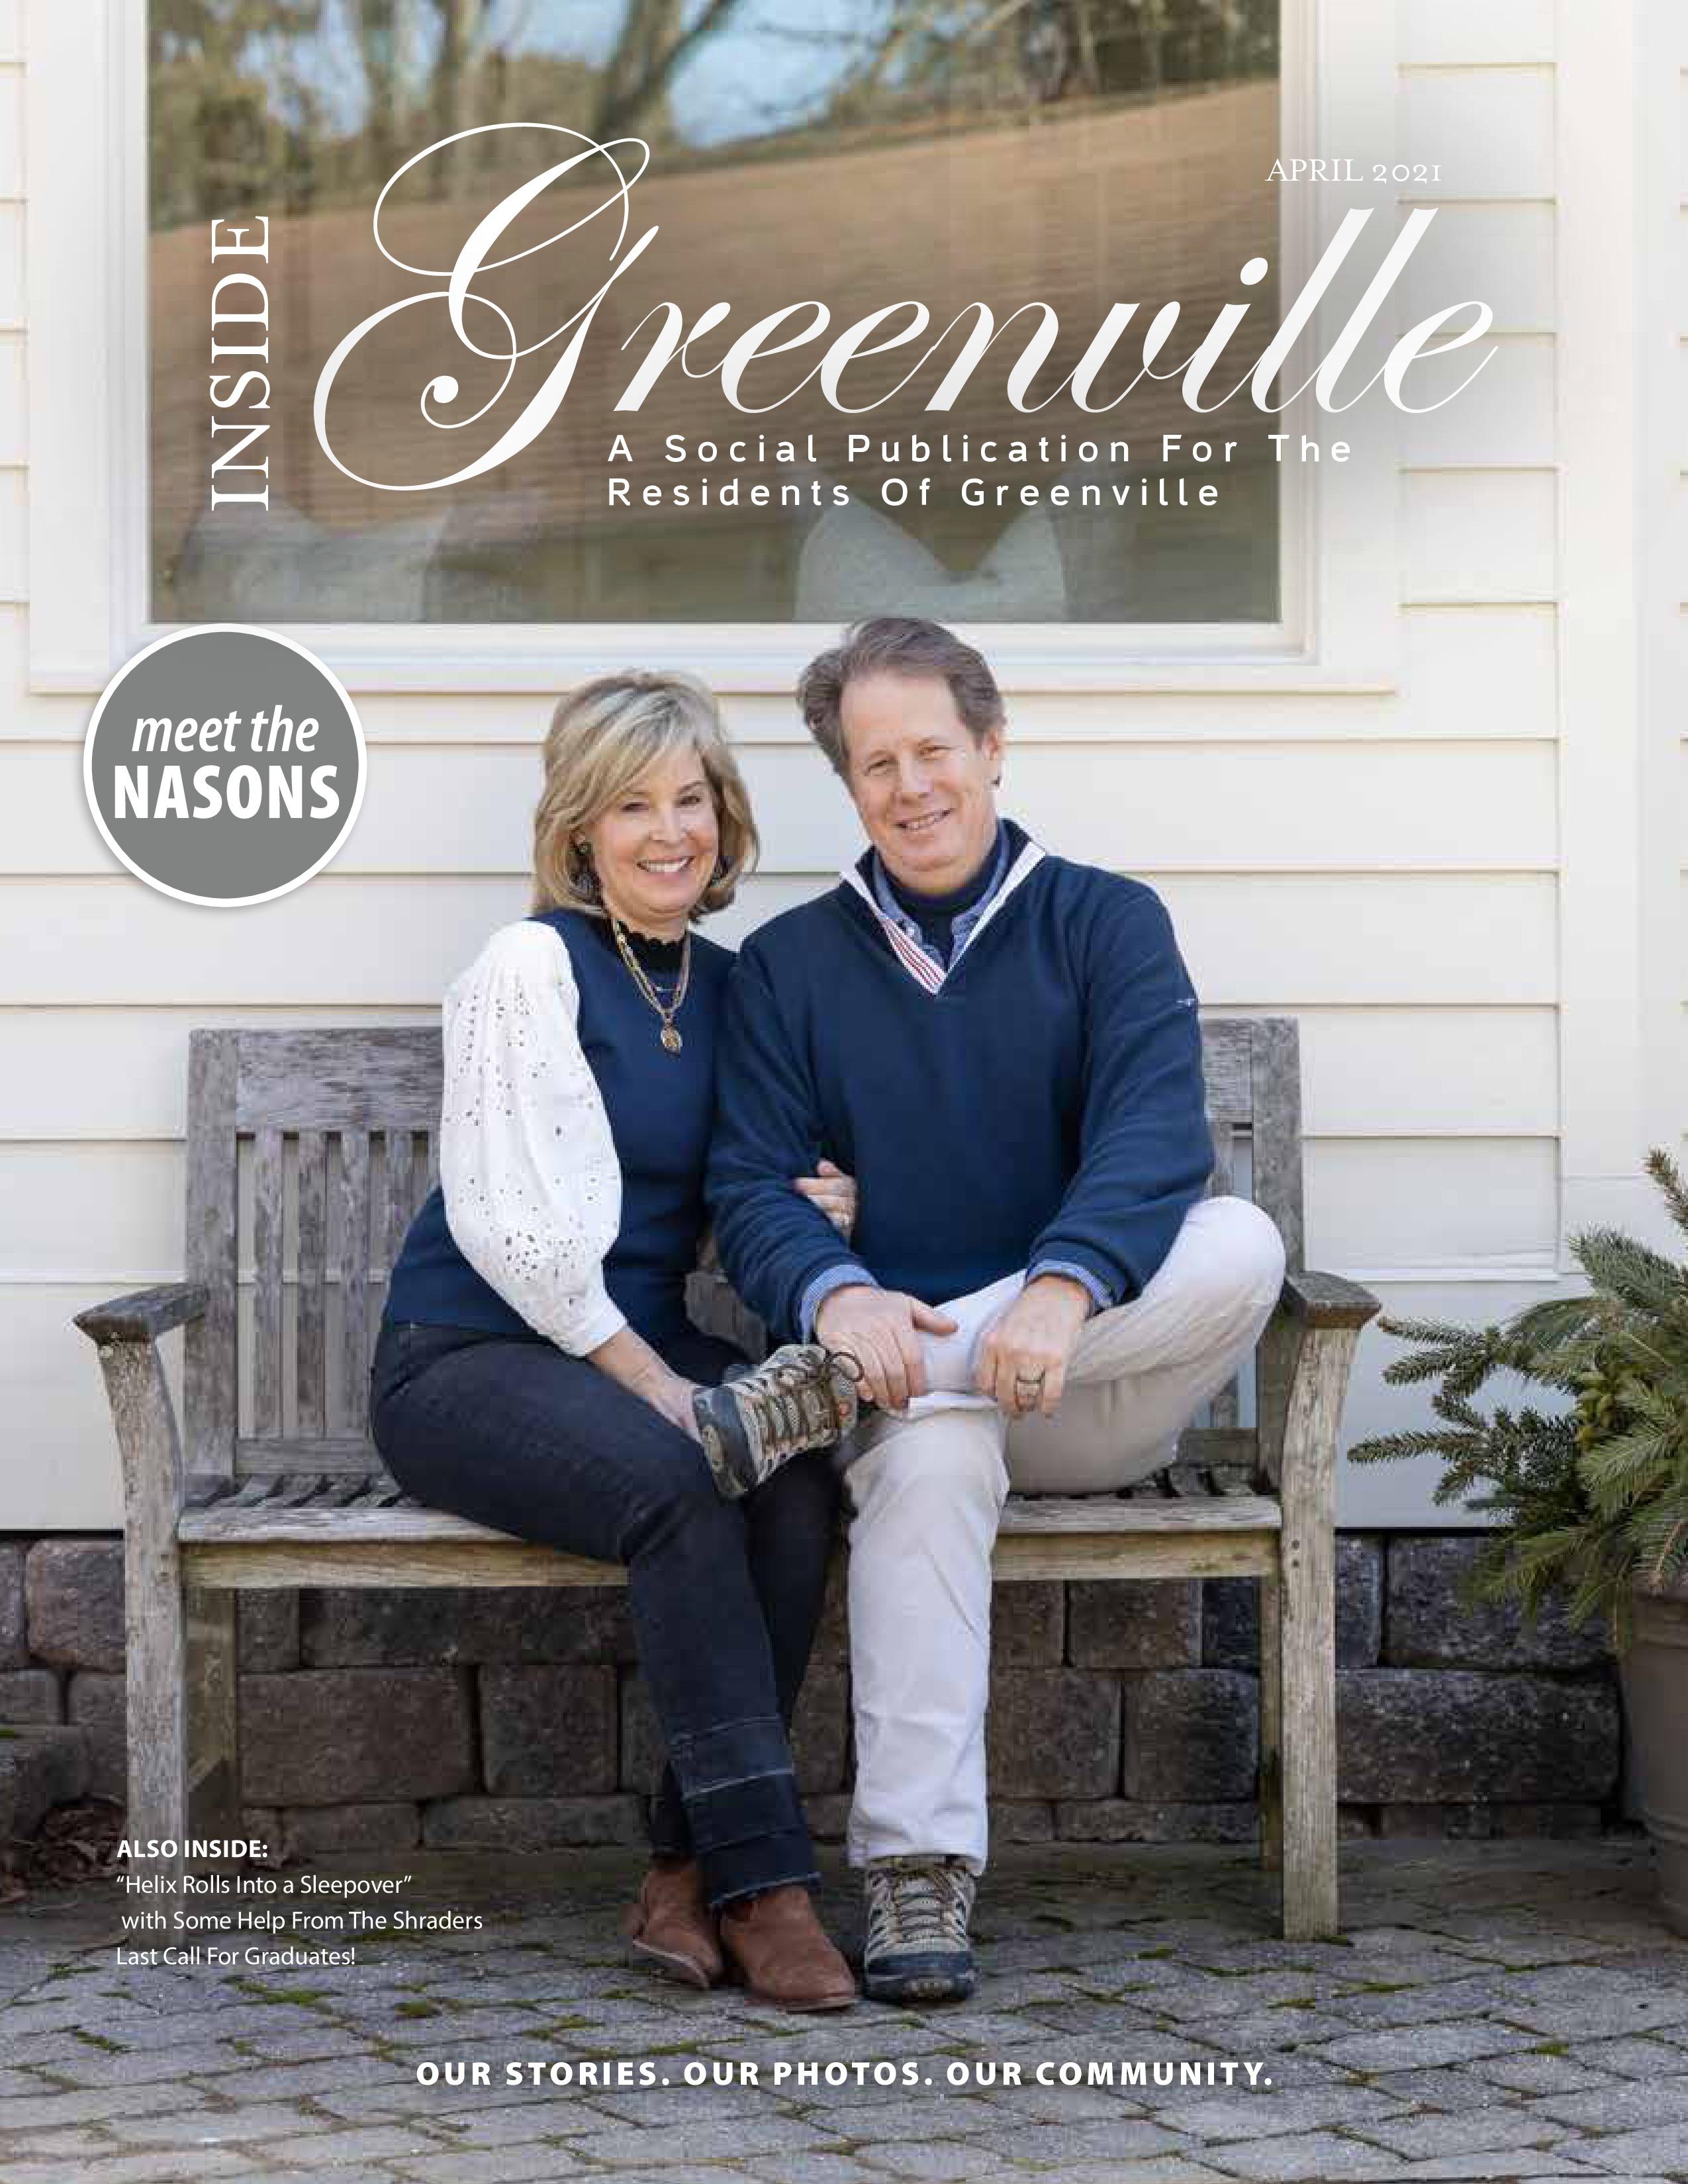 Inside Greenville 2021-04-01